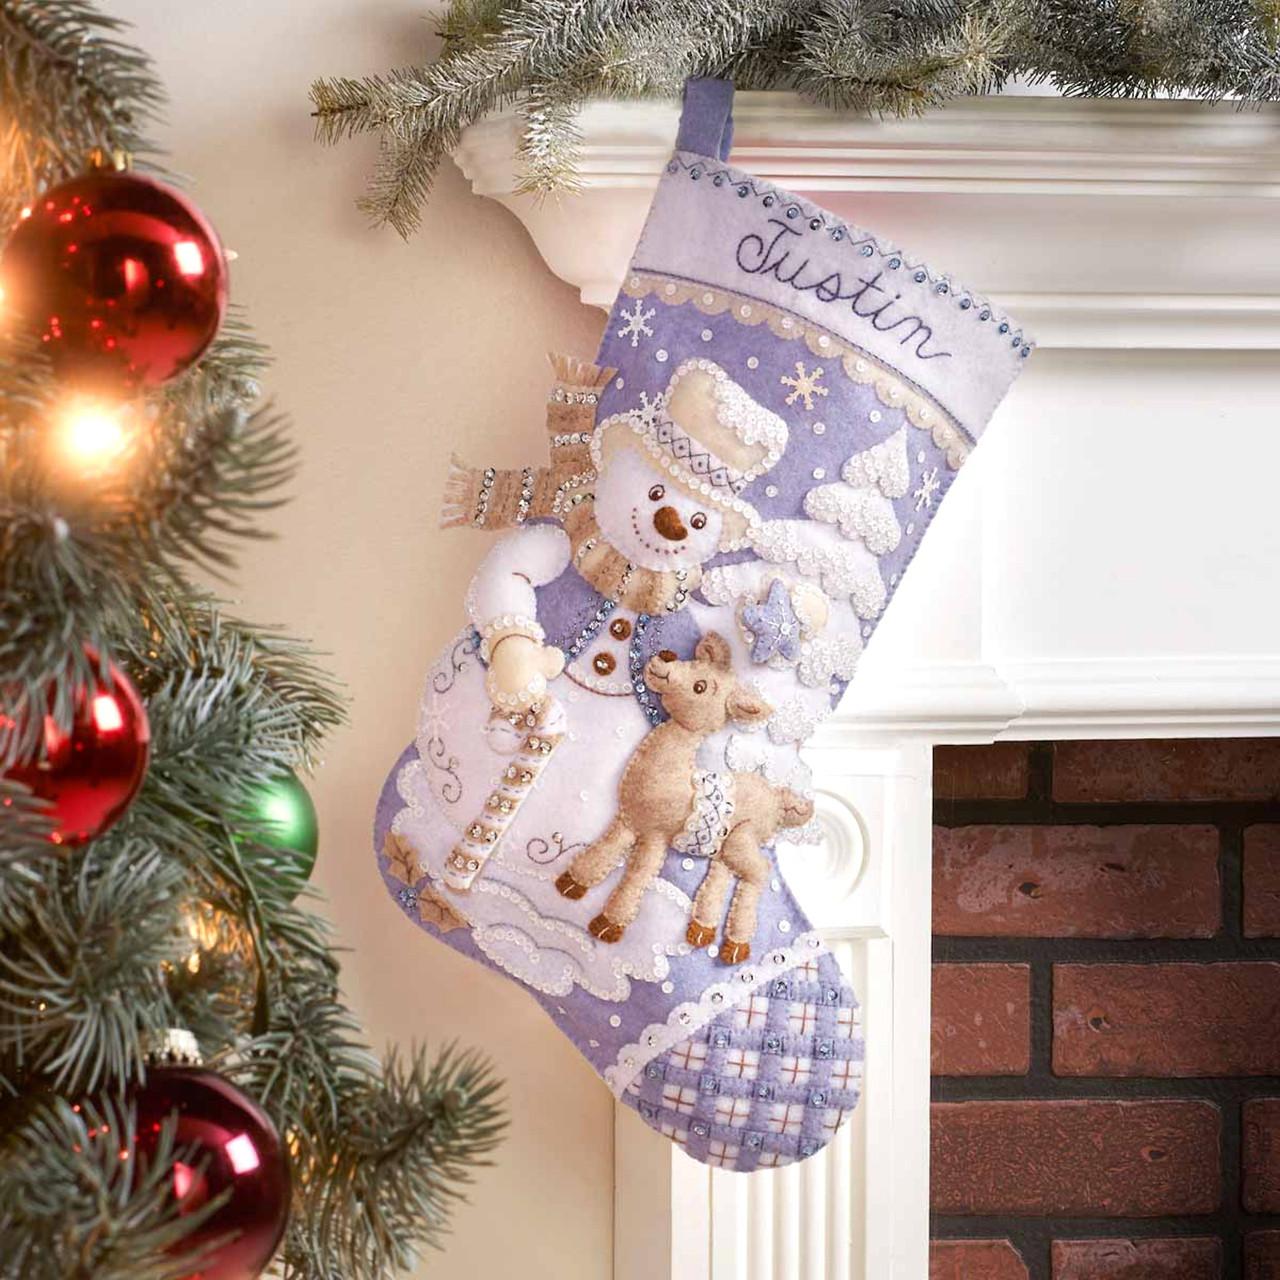 Plaid / Bucilla - Snowman's Winter Wonderland Christmas Stocking